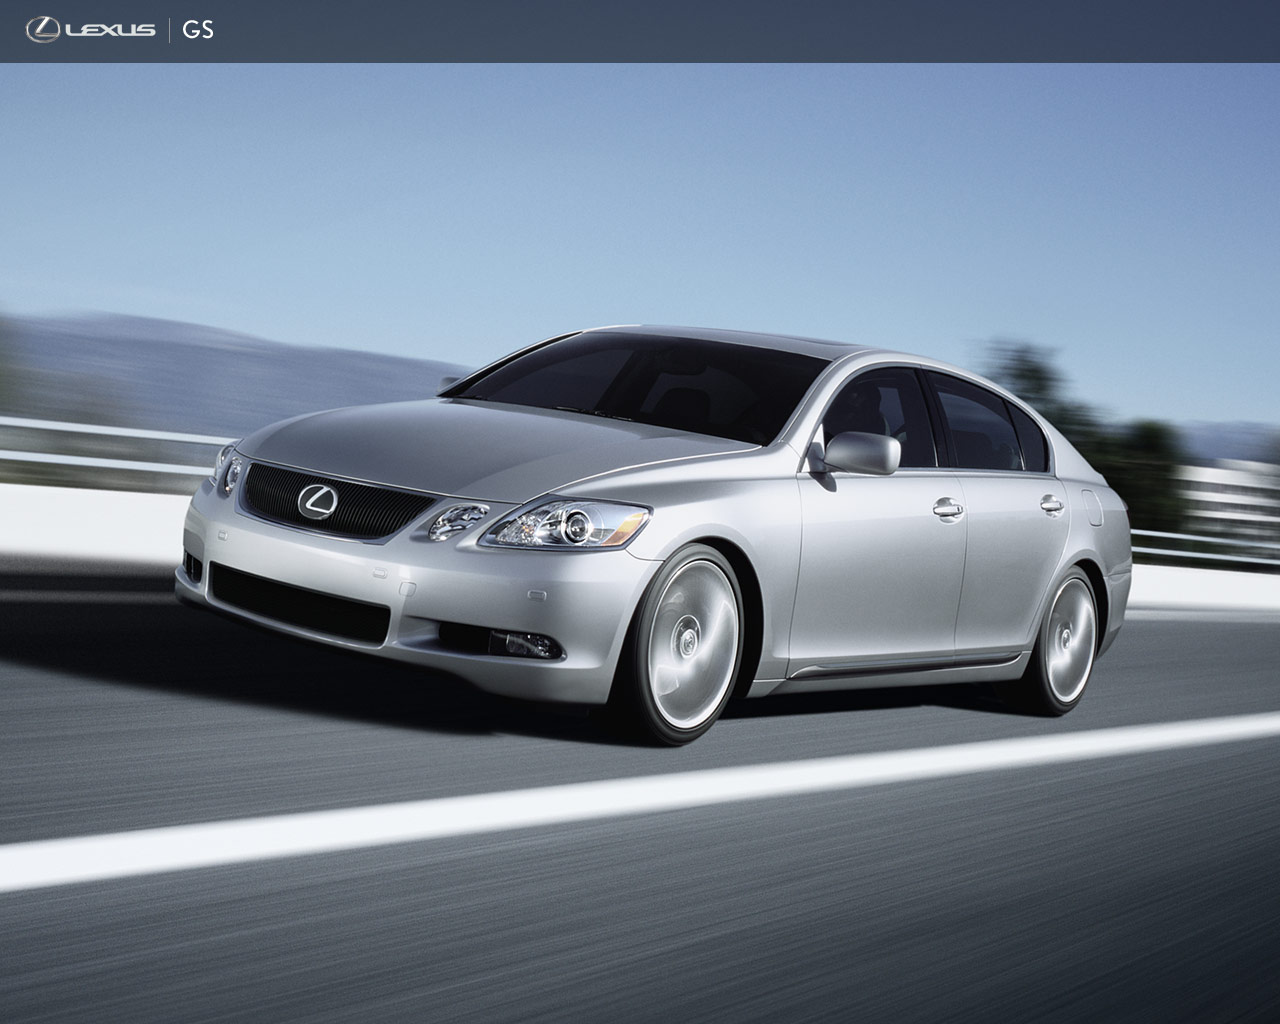 16 Luxury Pubg Wallpaper Iphone 6: 2007 Lexus GS 350 Desktop Wallpaper And High Resolution